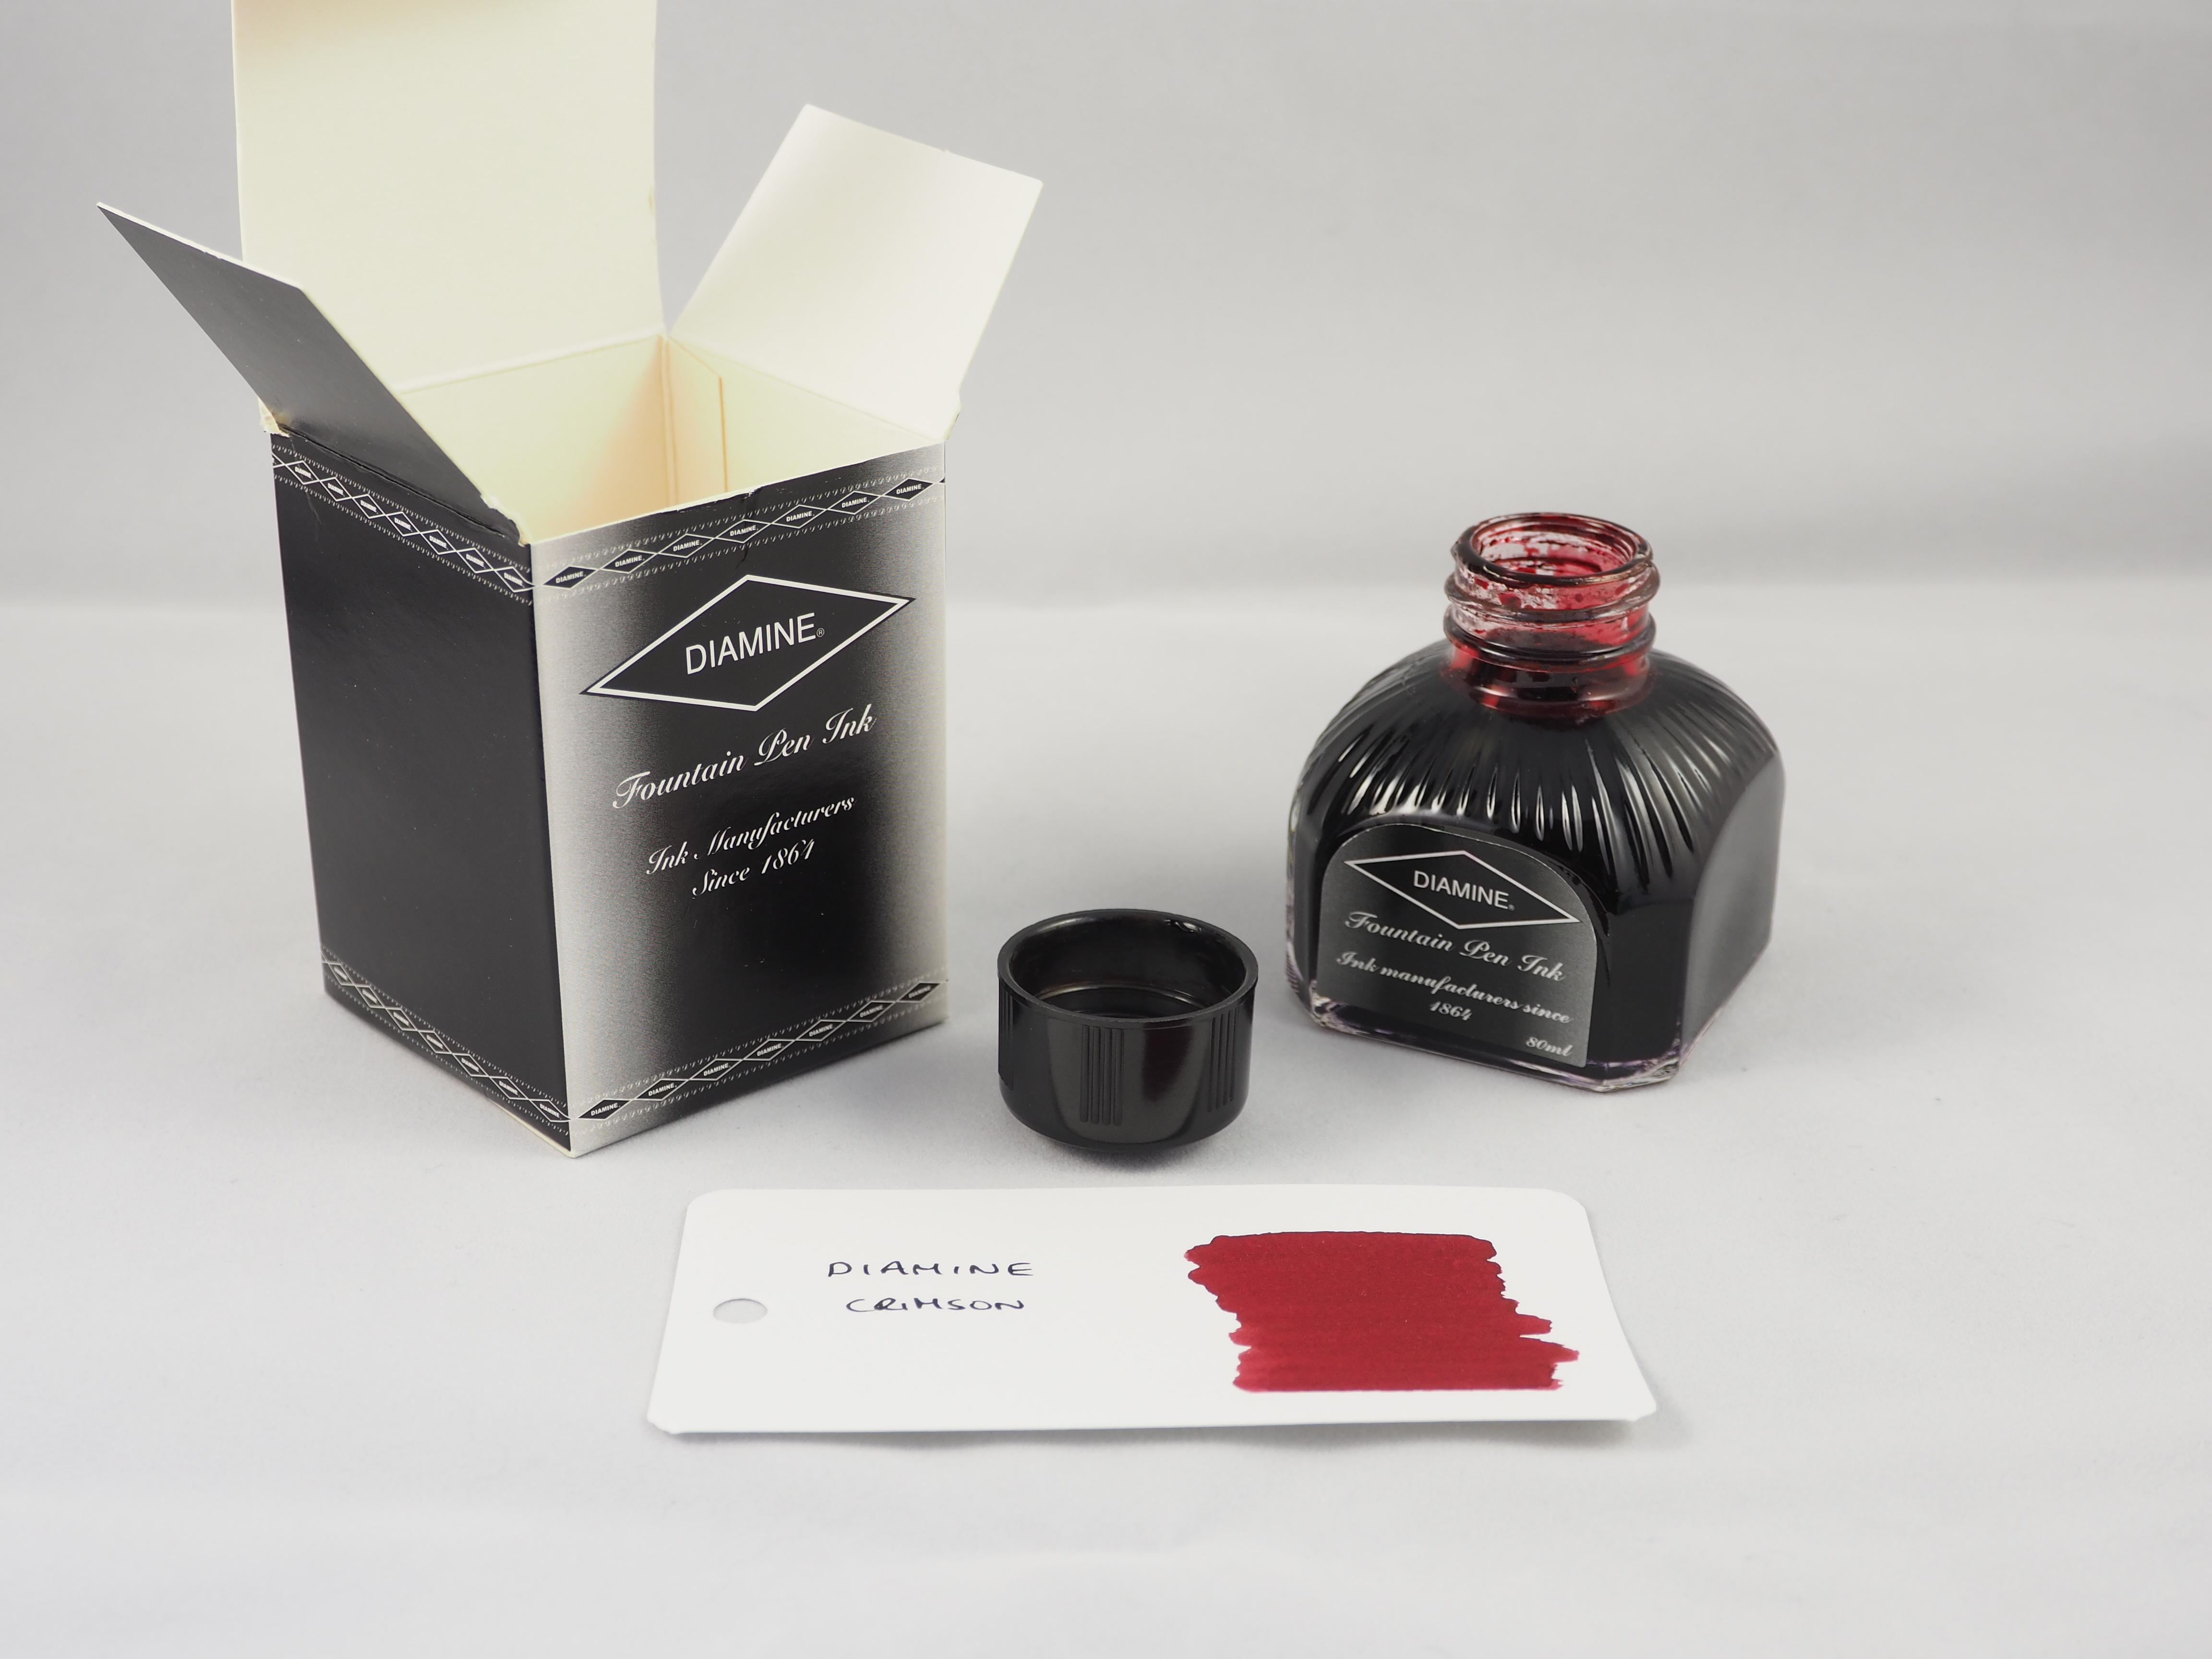 Roses In Garden: Diamine Crimson Ink Review